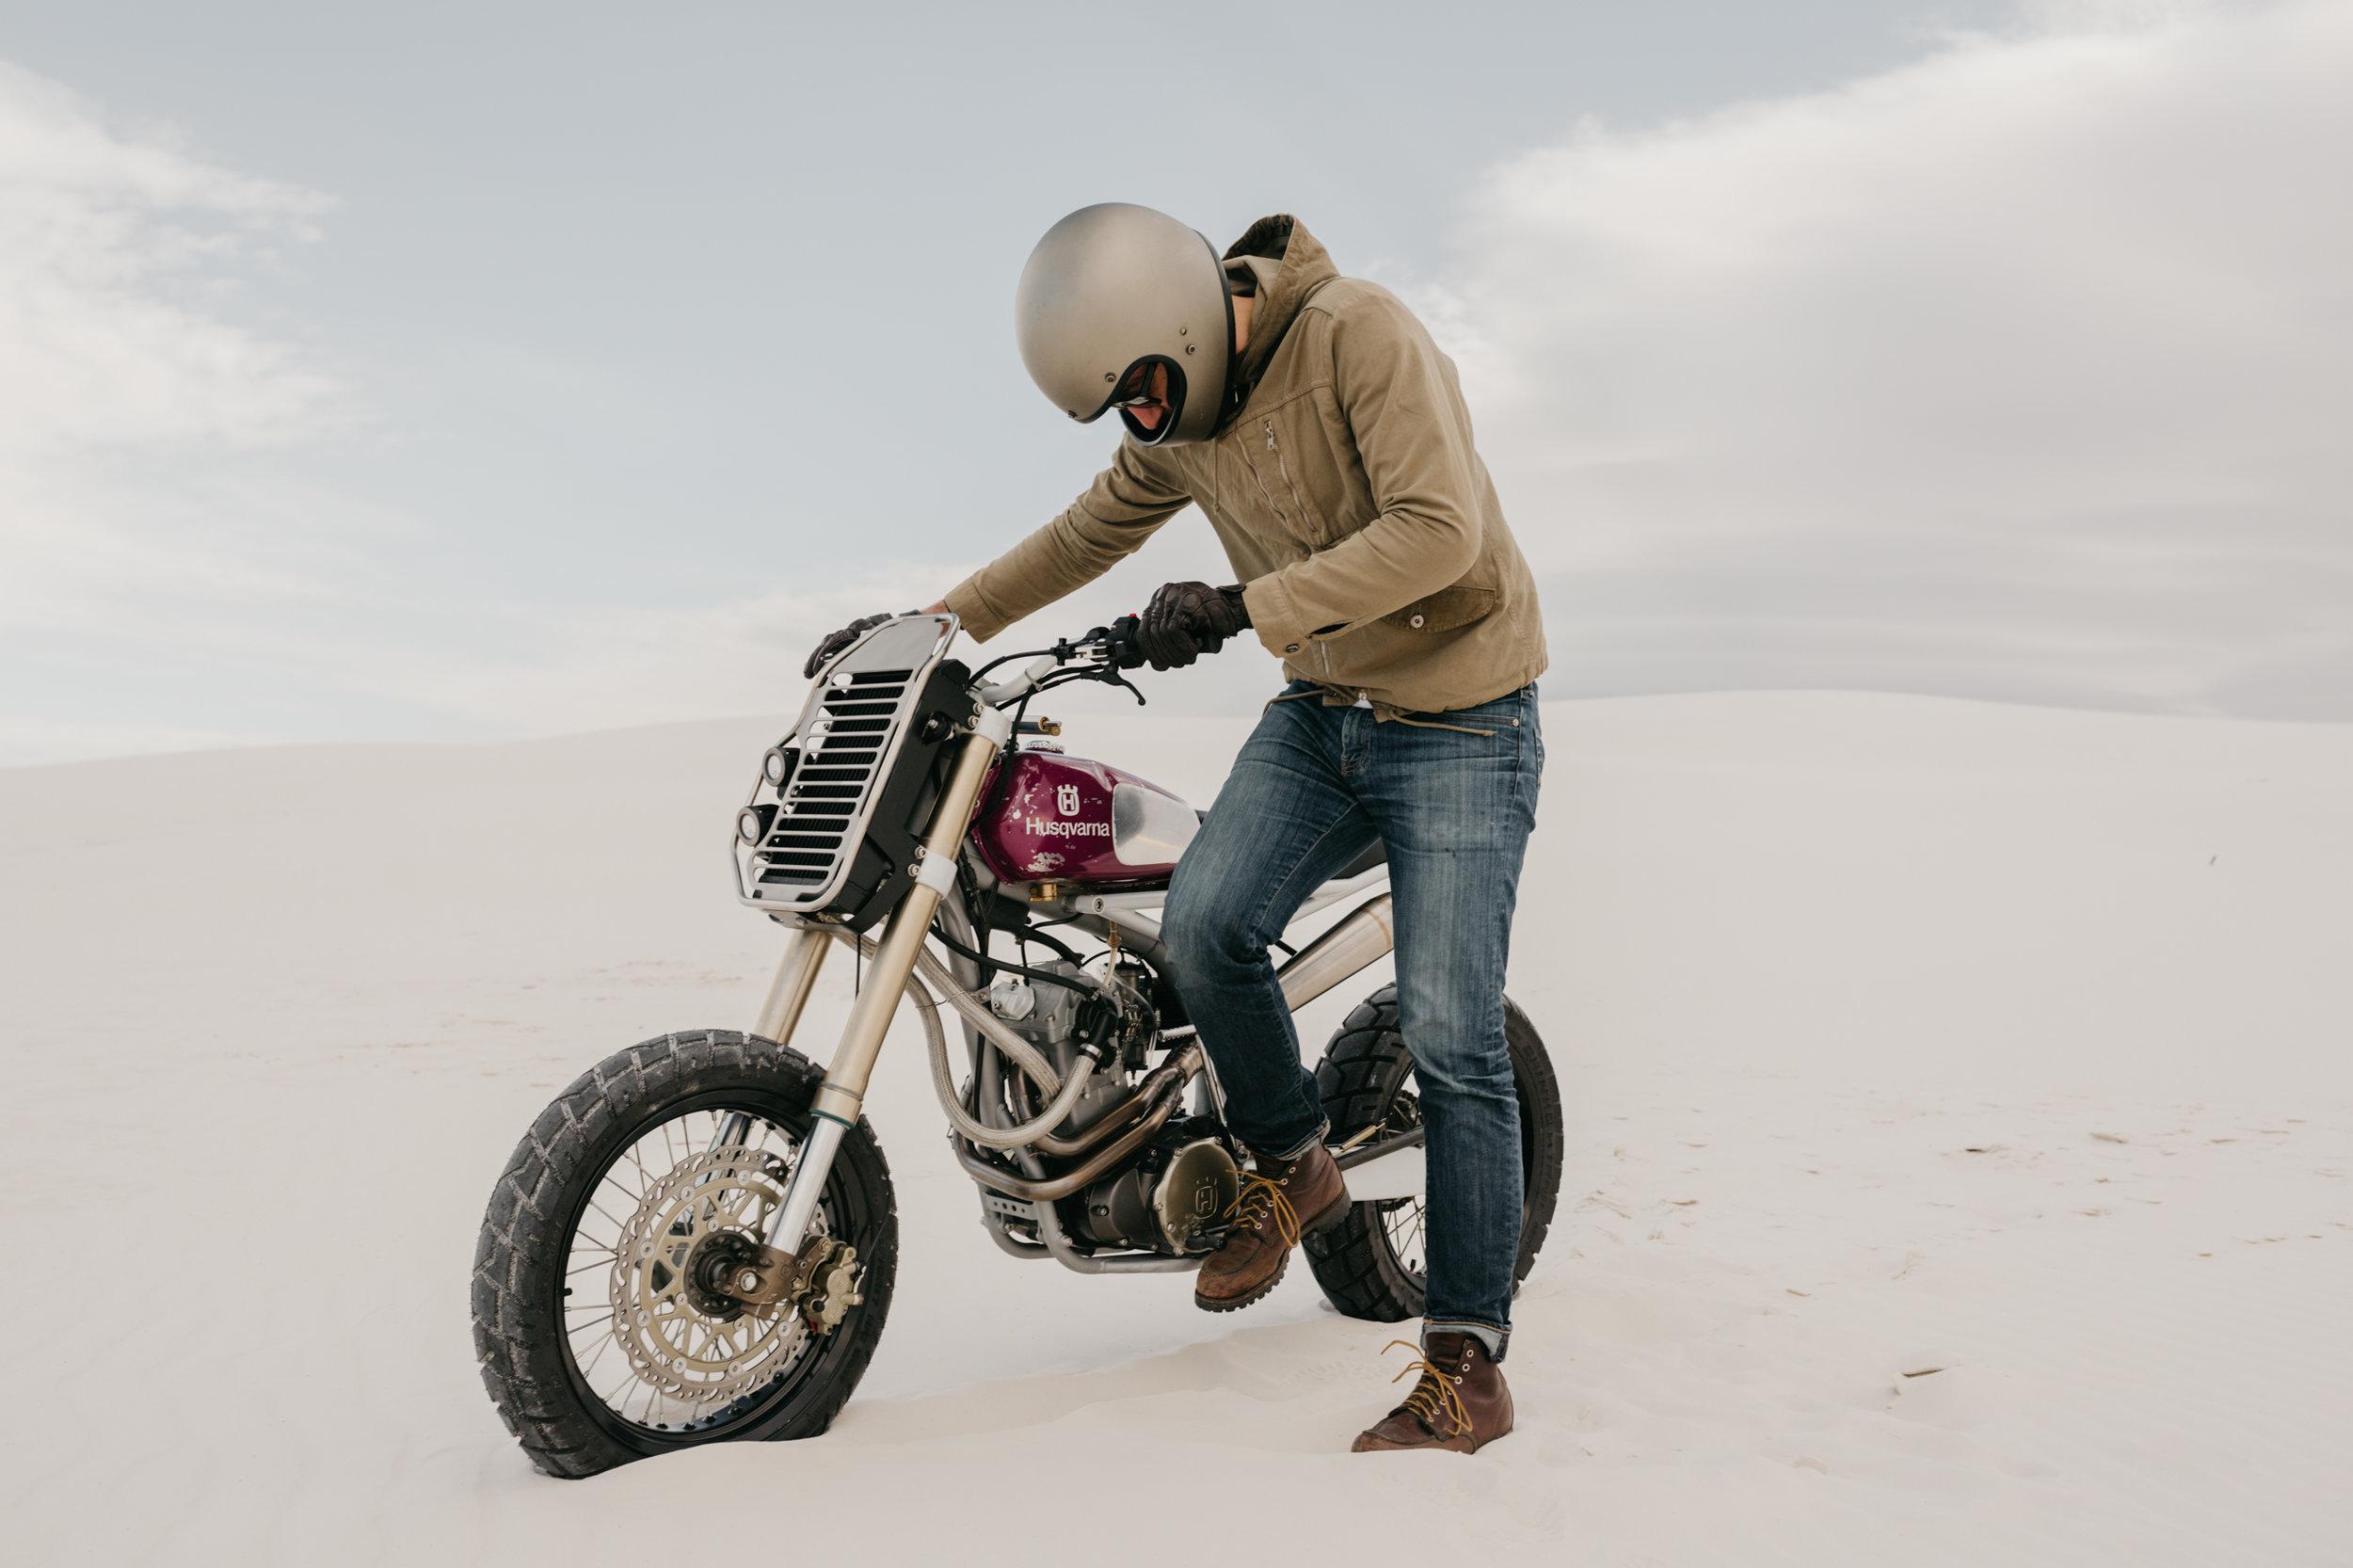 Moto-Mucci_Husqvarna_570_White_Sands (2).JPG